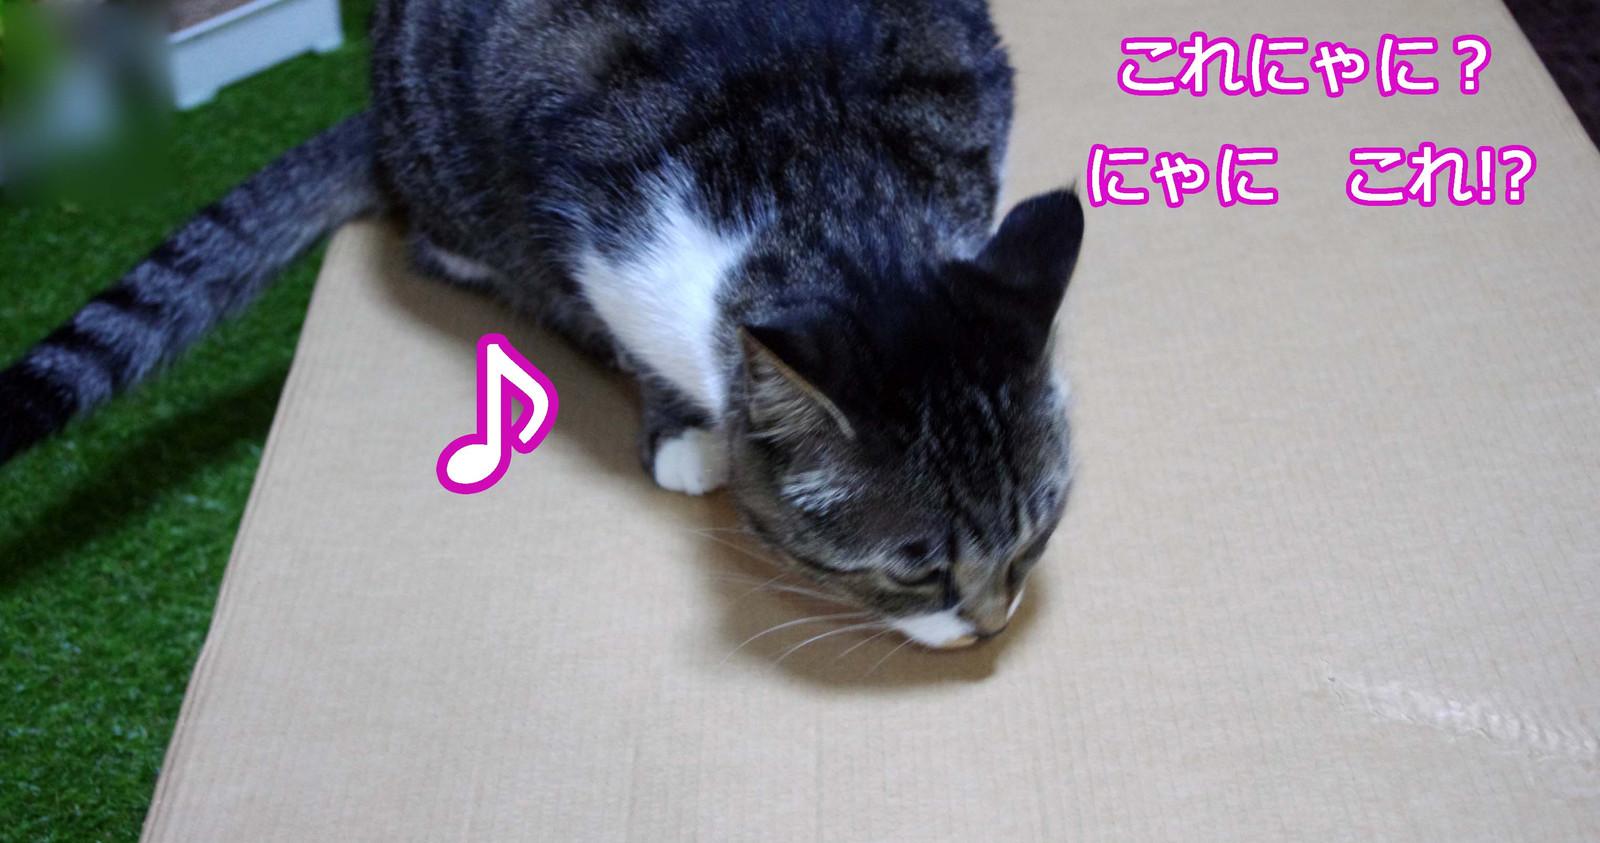 2012_07_08_5956_edited1